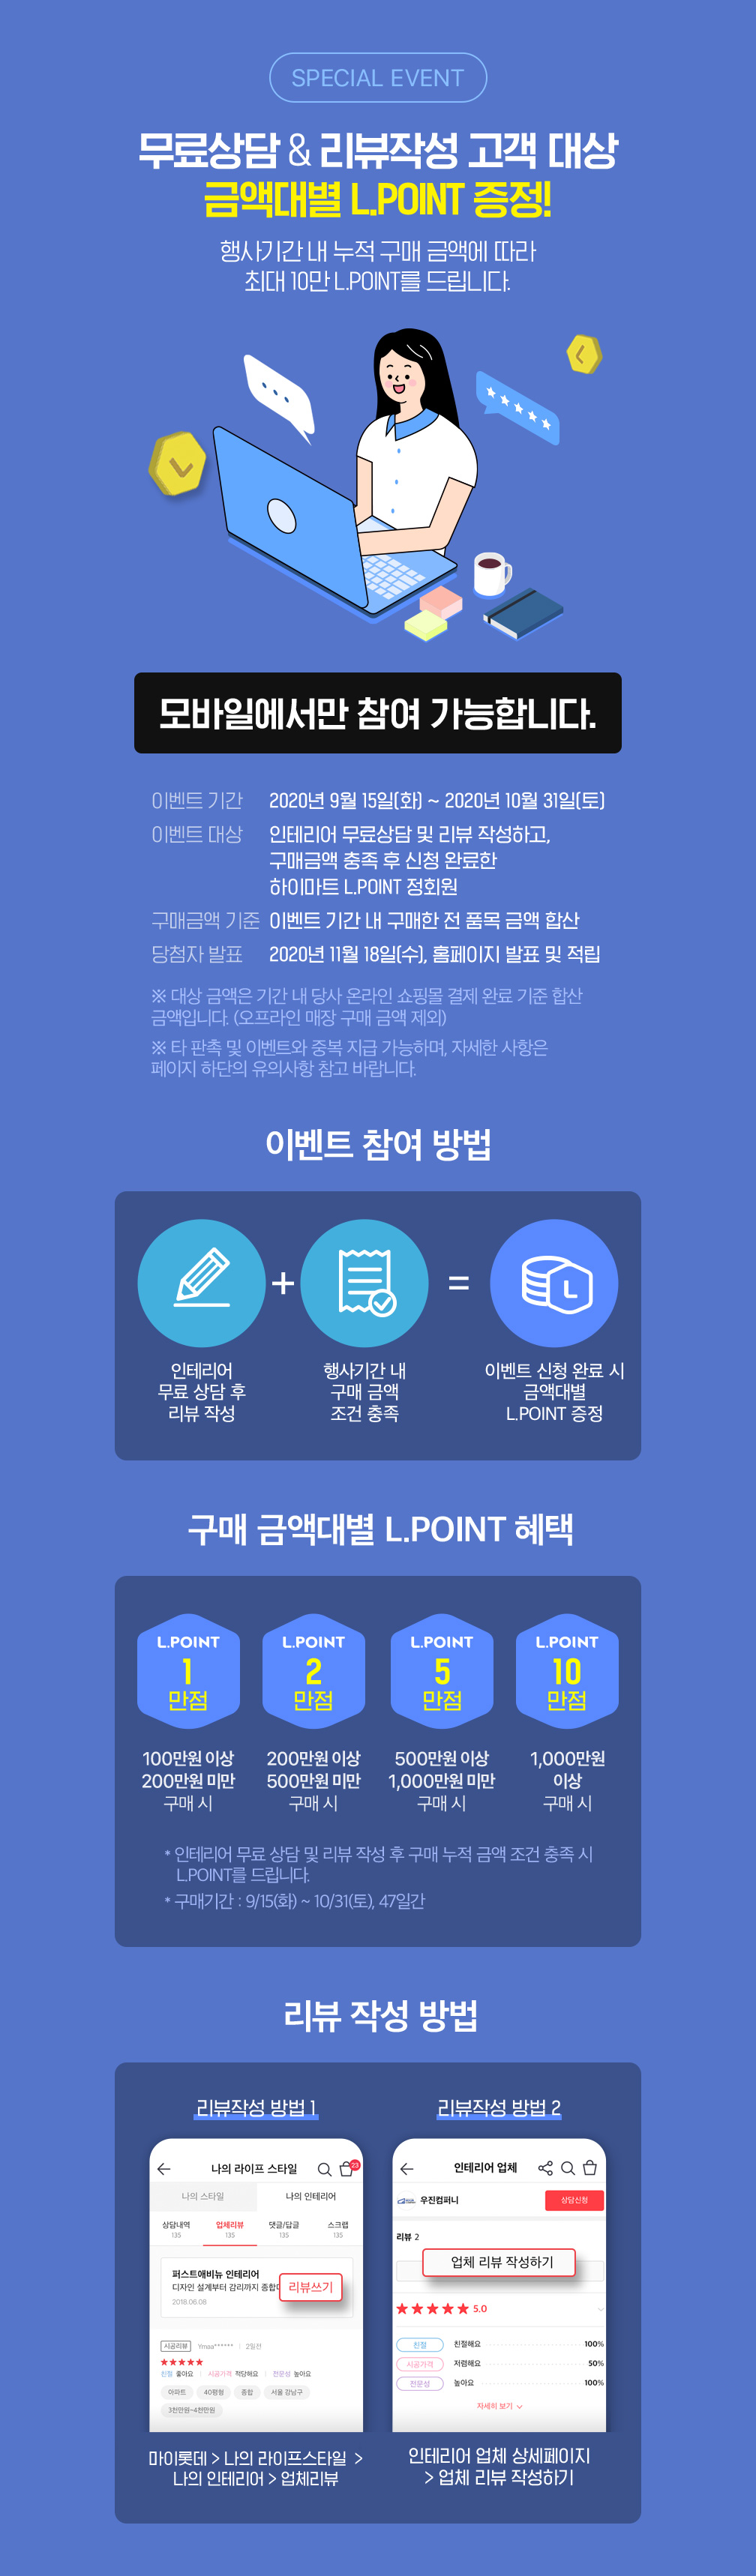 SPECIAL EVENT 무료상담&리뷰작성 고객 대상 금액대별 L.POINT 증정